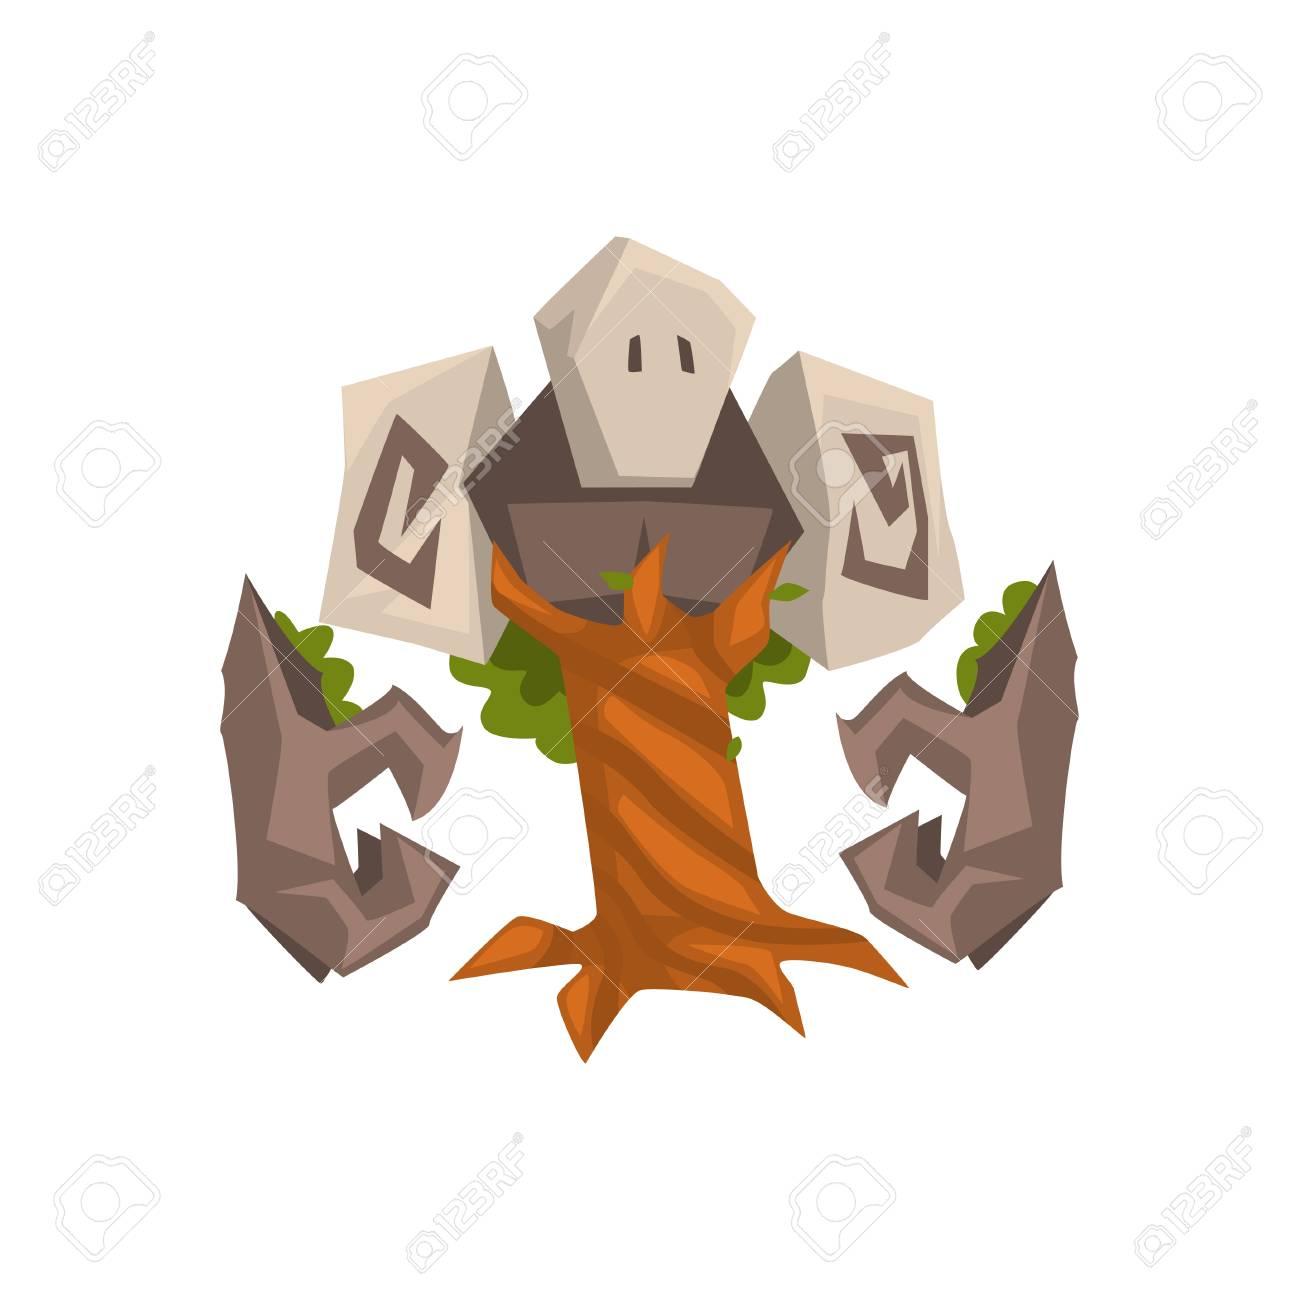 Stone Tree Golem, Fantasy Mystic Monster Creature Cartoon Character Vector Illustration - 120701418